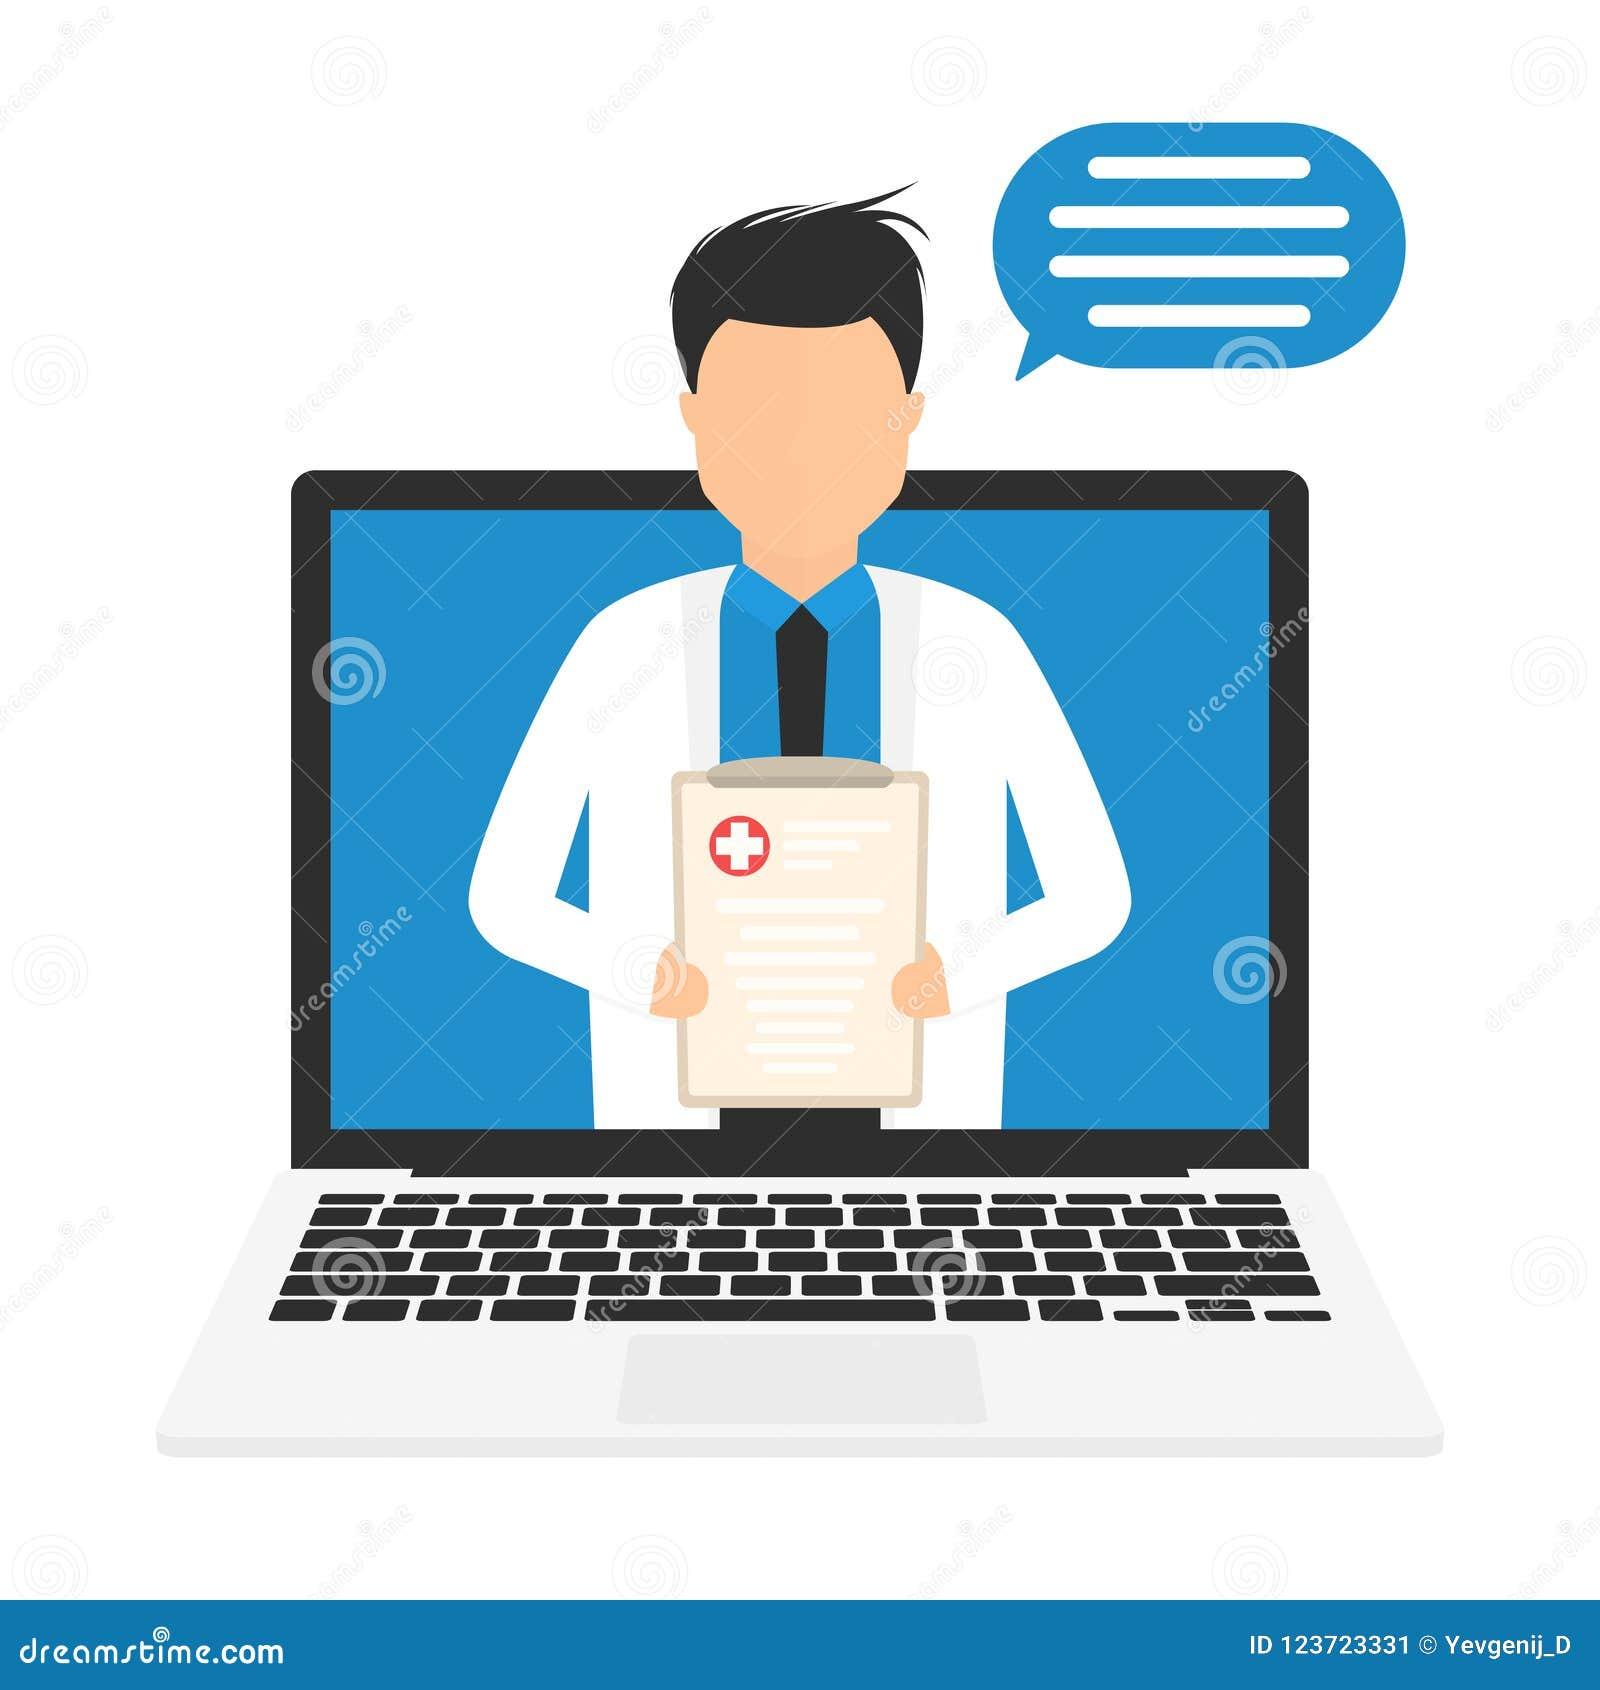 On-line-Medizinkonzept Medizinische on-line-Behandlung Digital On-line-Doktor oder Apotheker, medizinische Beratung